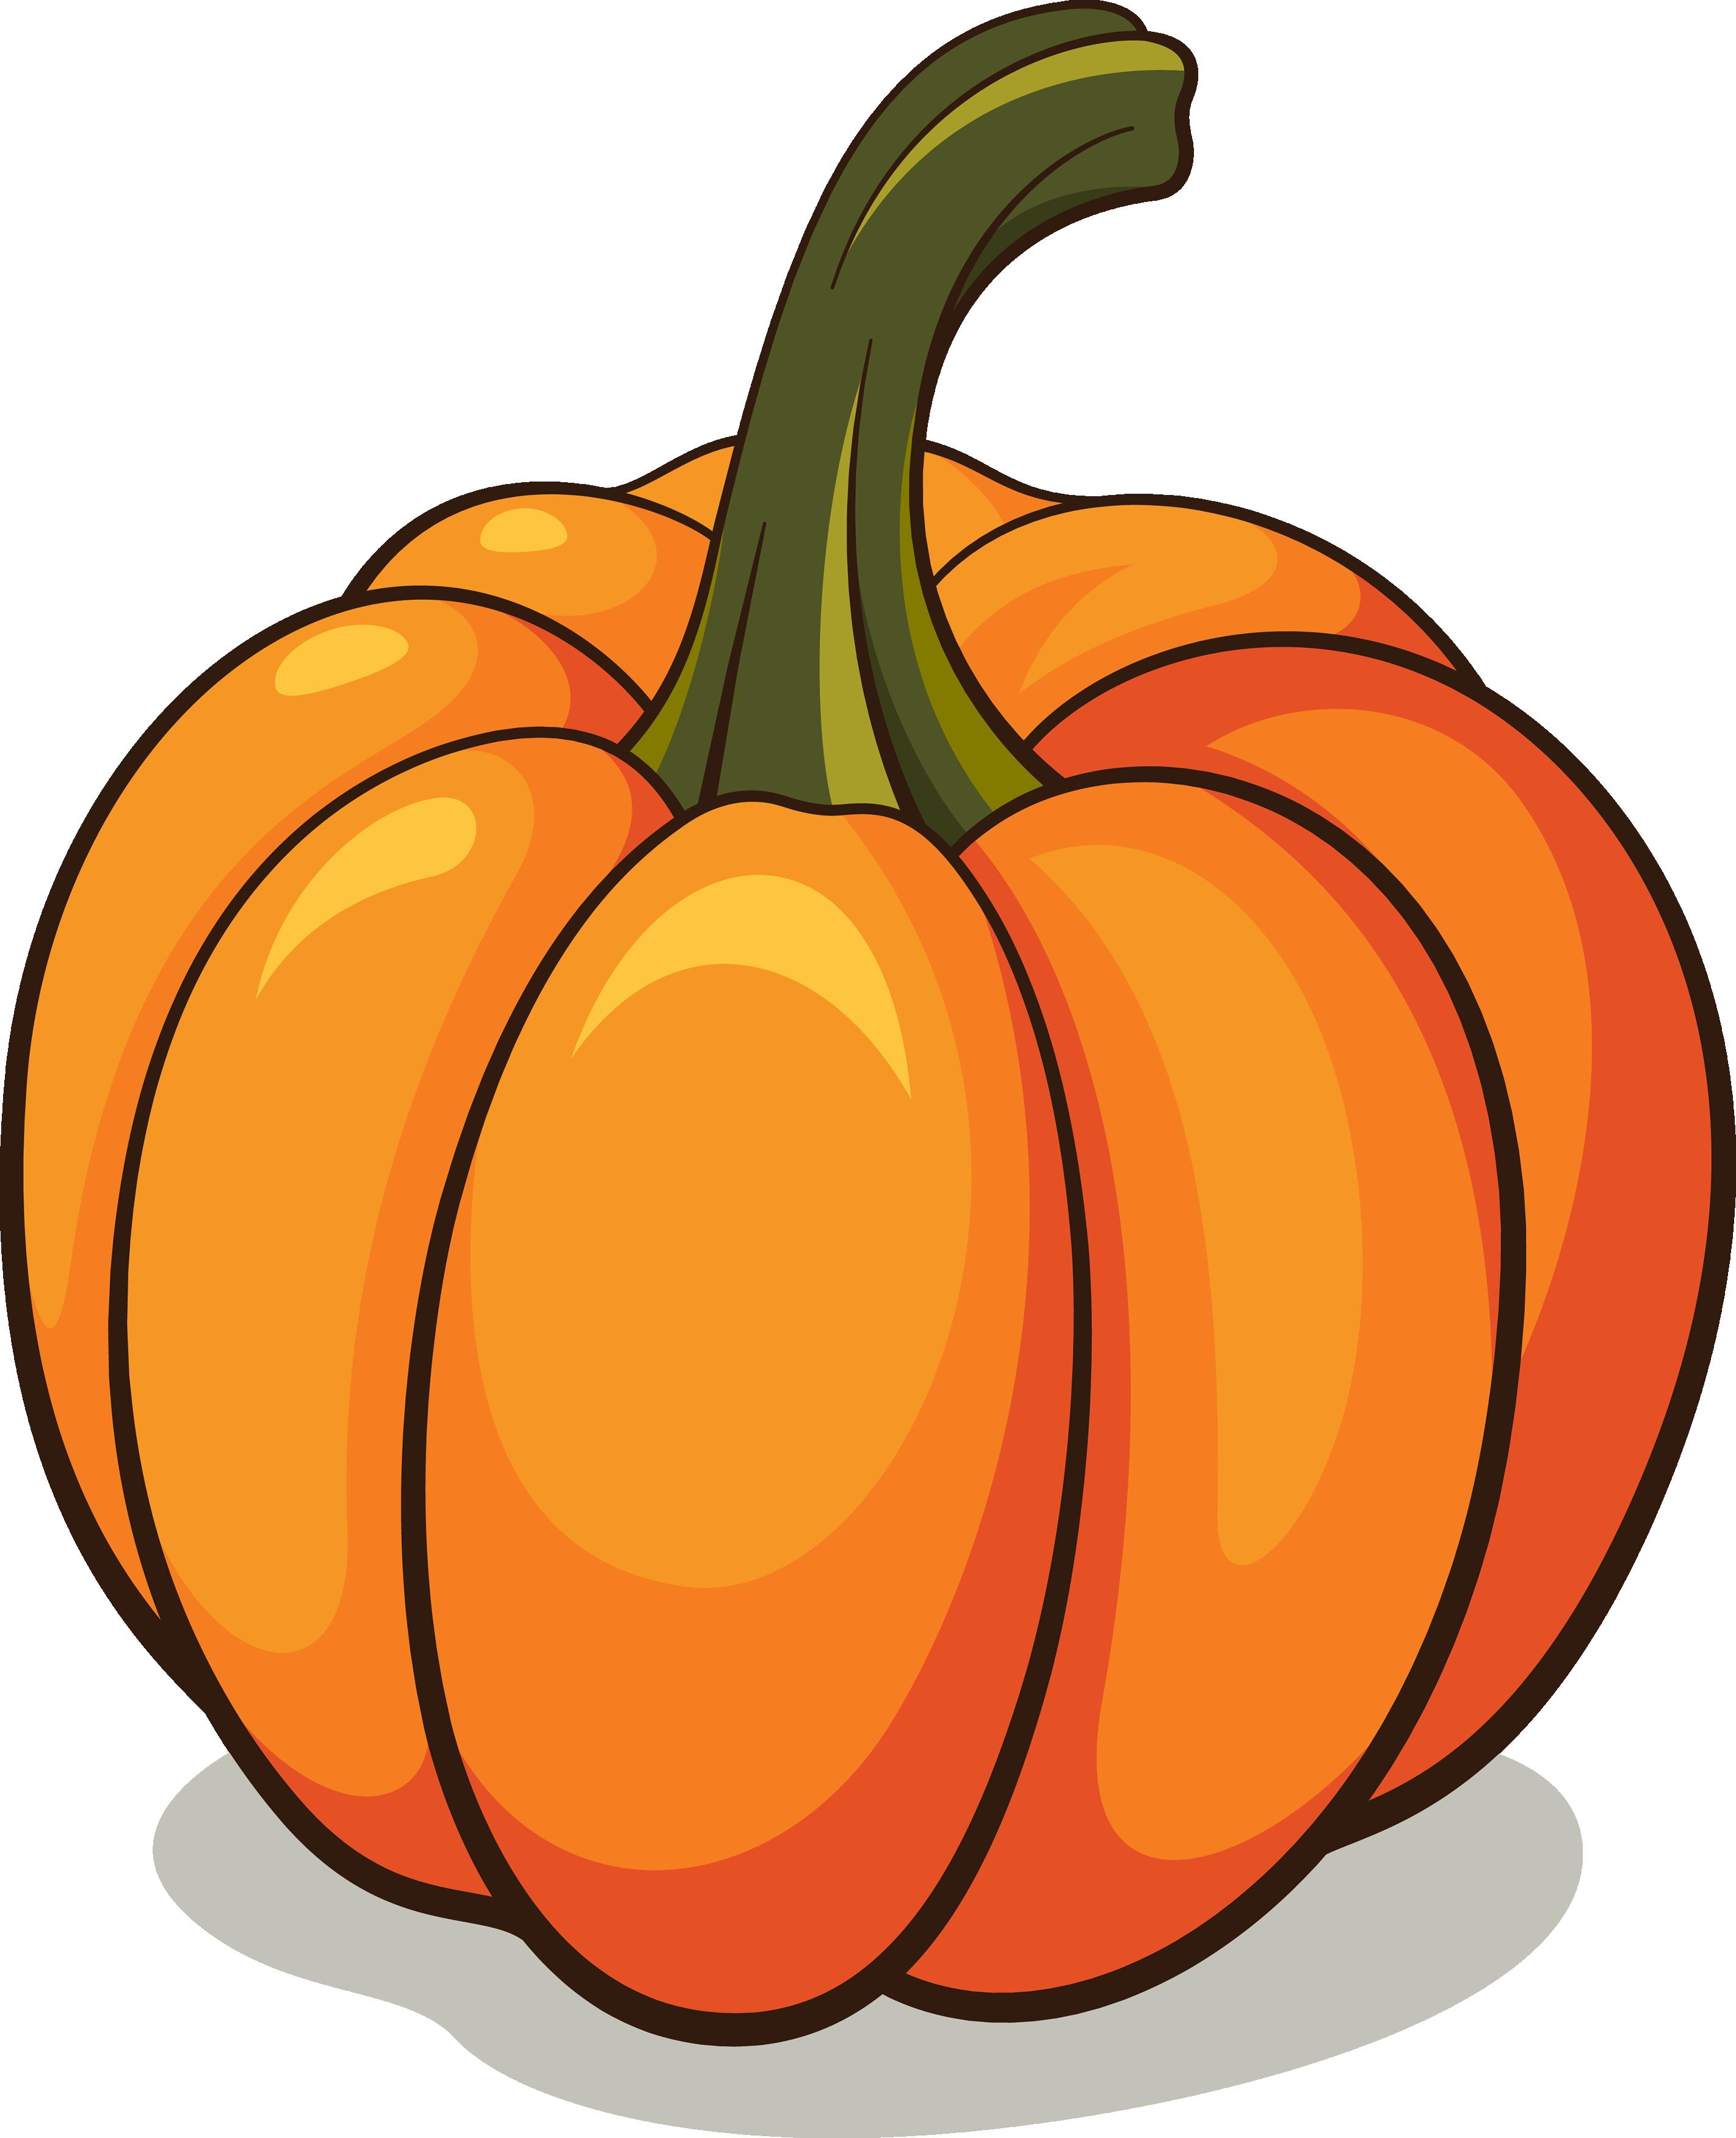 Tomatoes clipart splattered. Pumpkin png pixels art